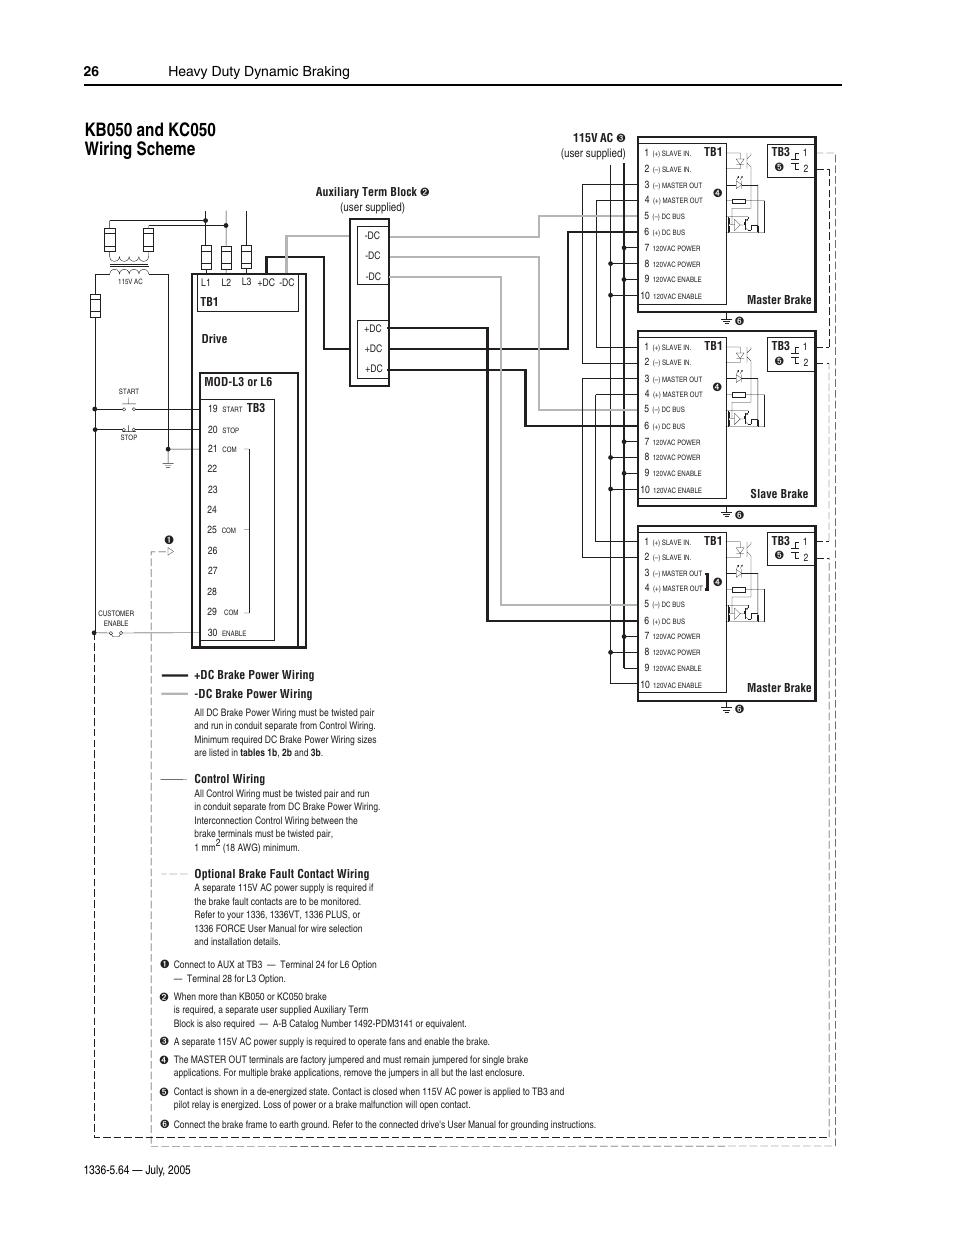 Kb050 and kc050 wiring scheme, Heavy duty dynamic braking